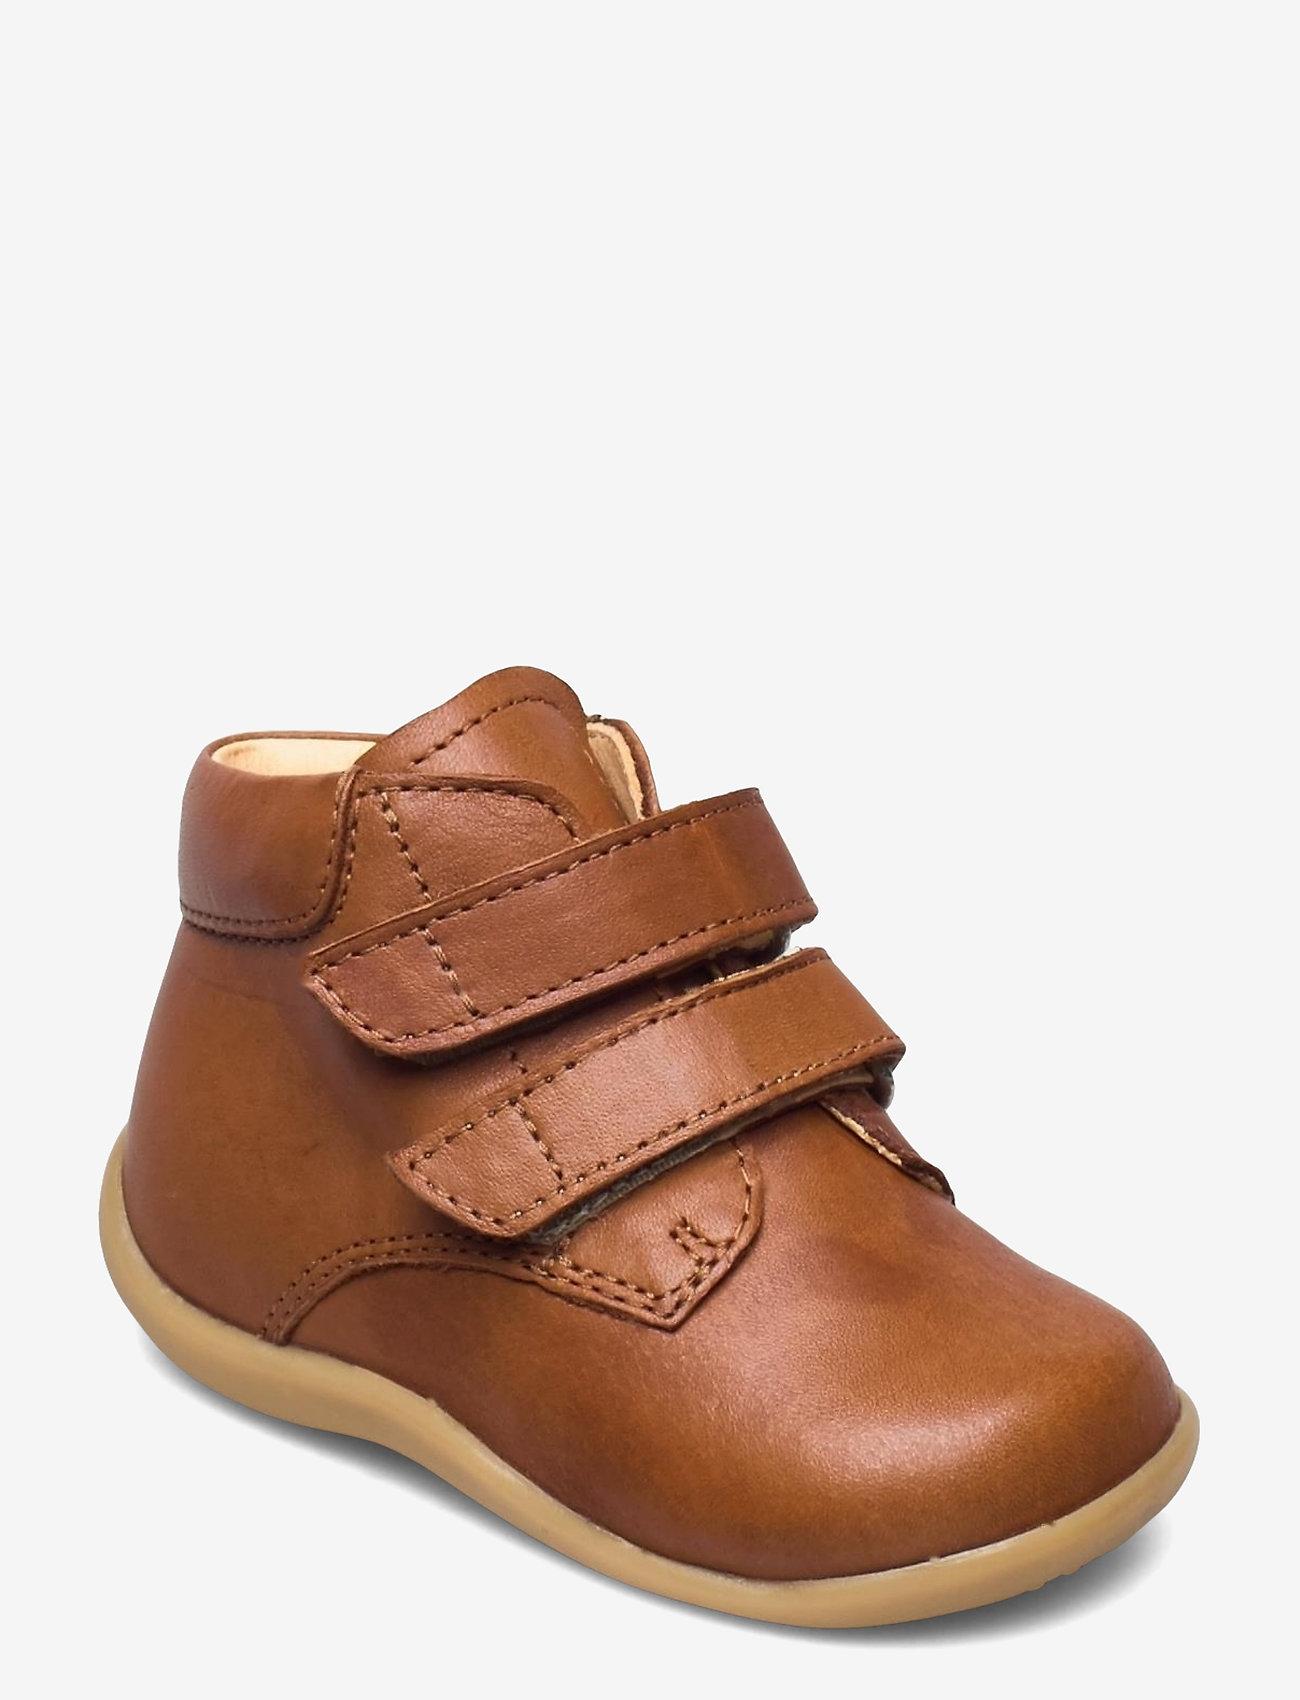 ANGULUS - Boots - flat - with velcro - lauflernschuhe - 1545 cognac - 0